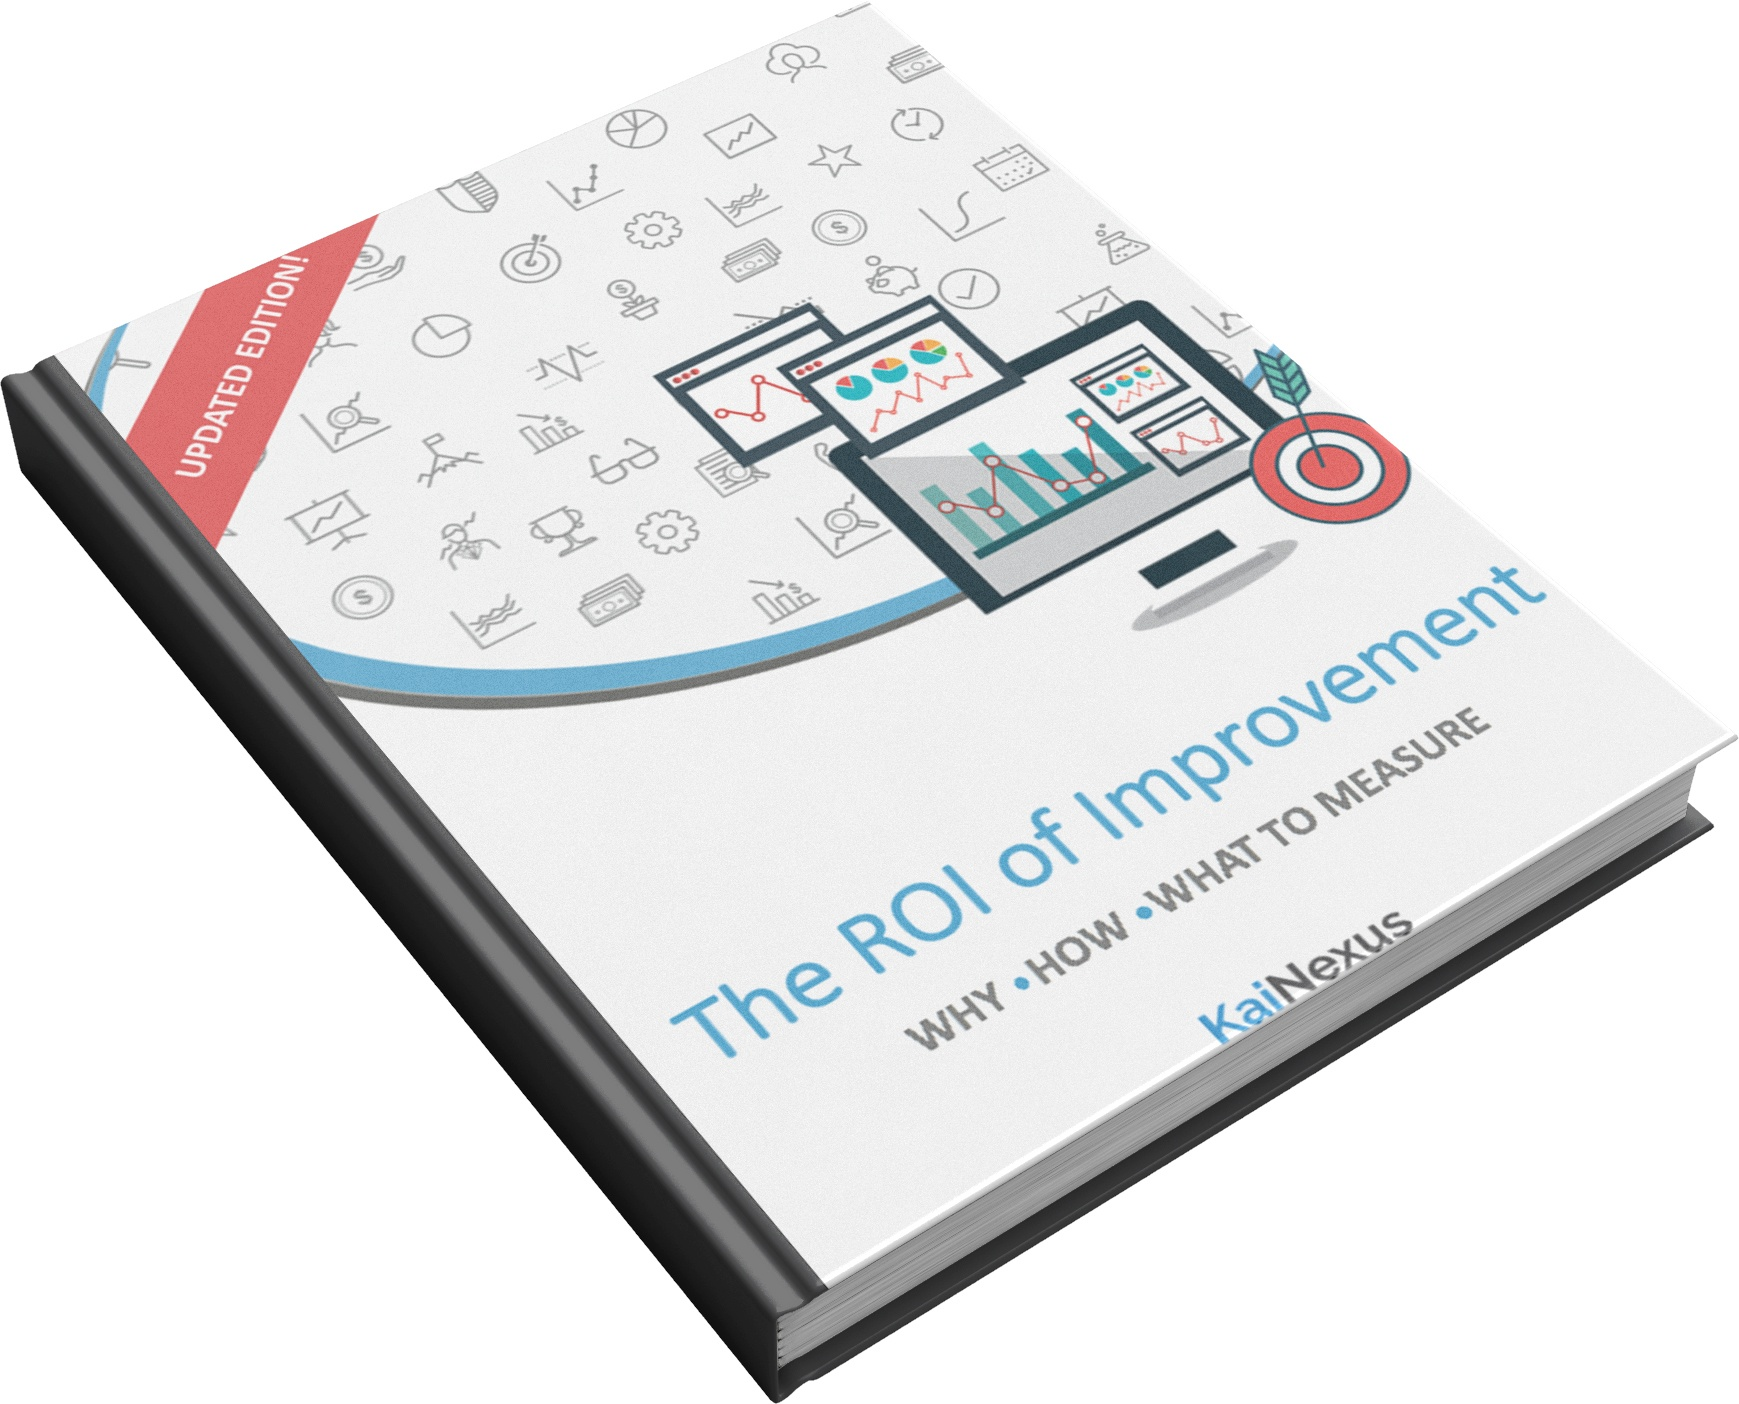 ROI of Improvement eBook Cover.jpg